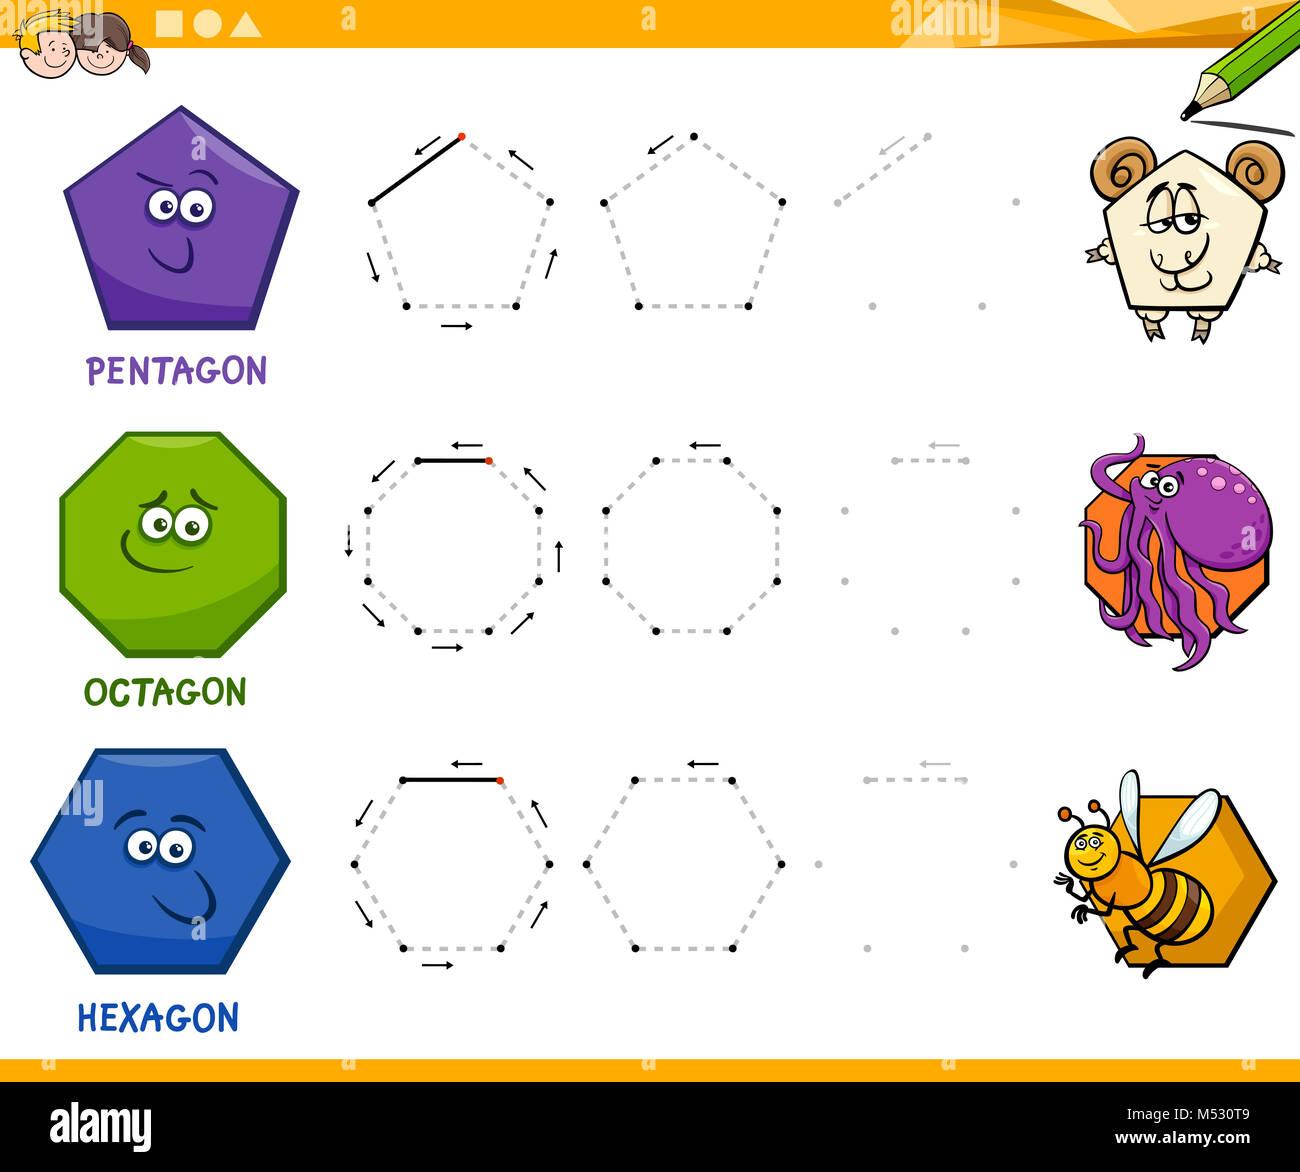 Octogon Worksheet